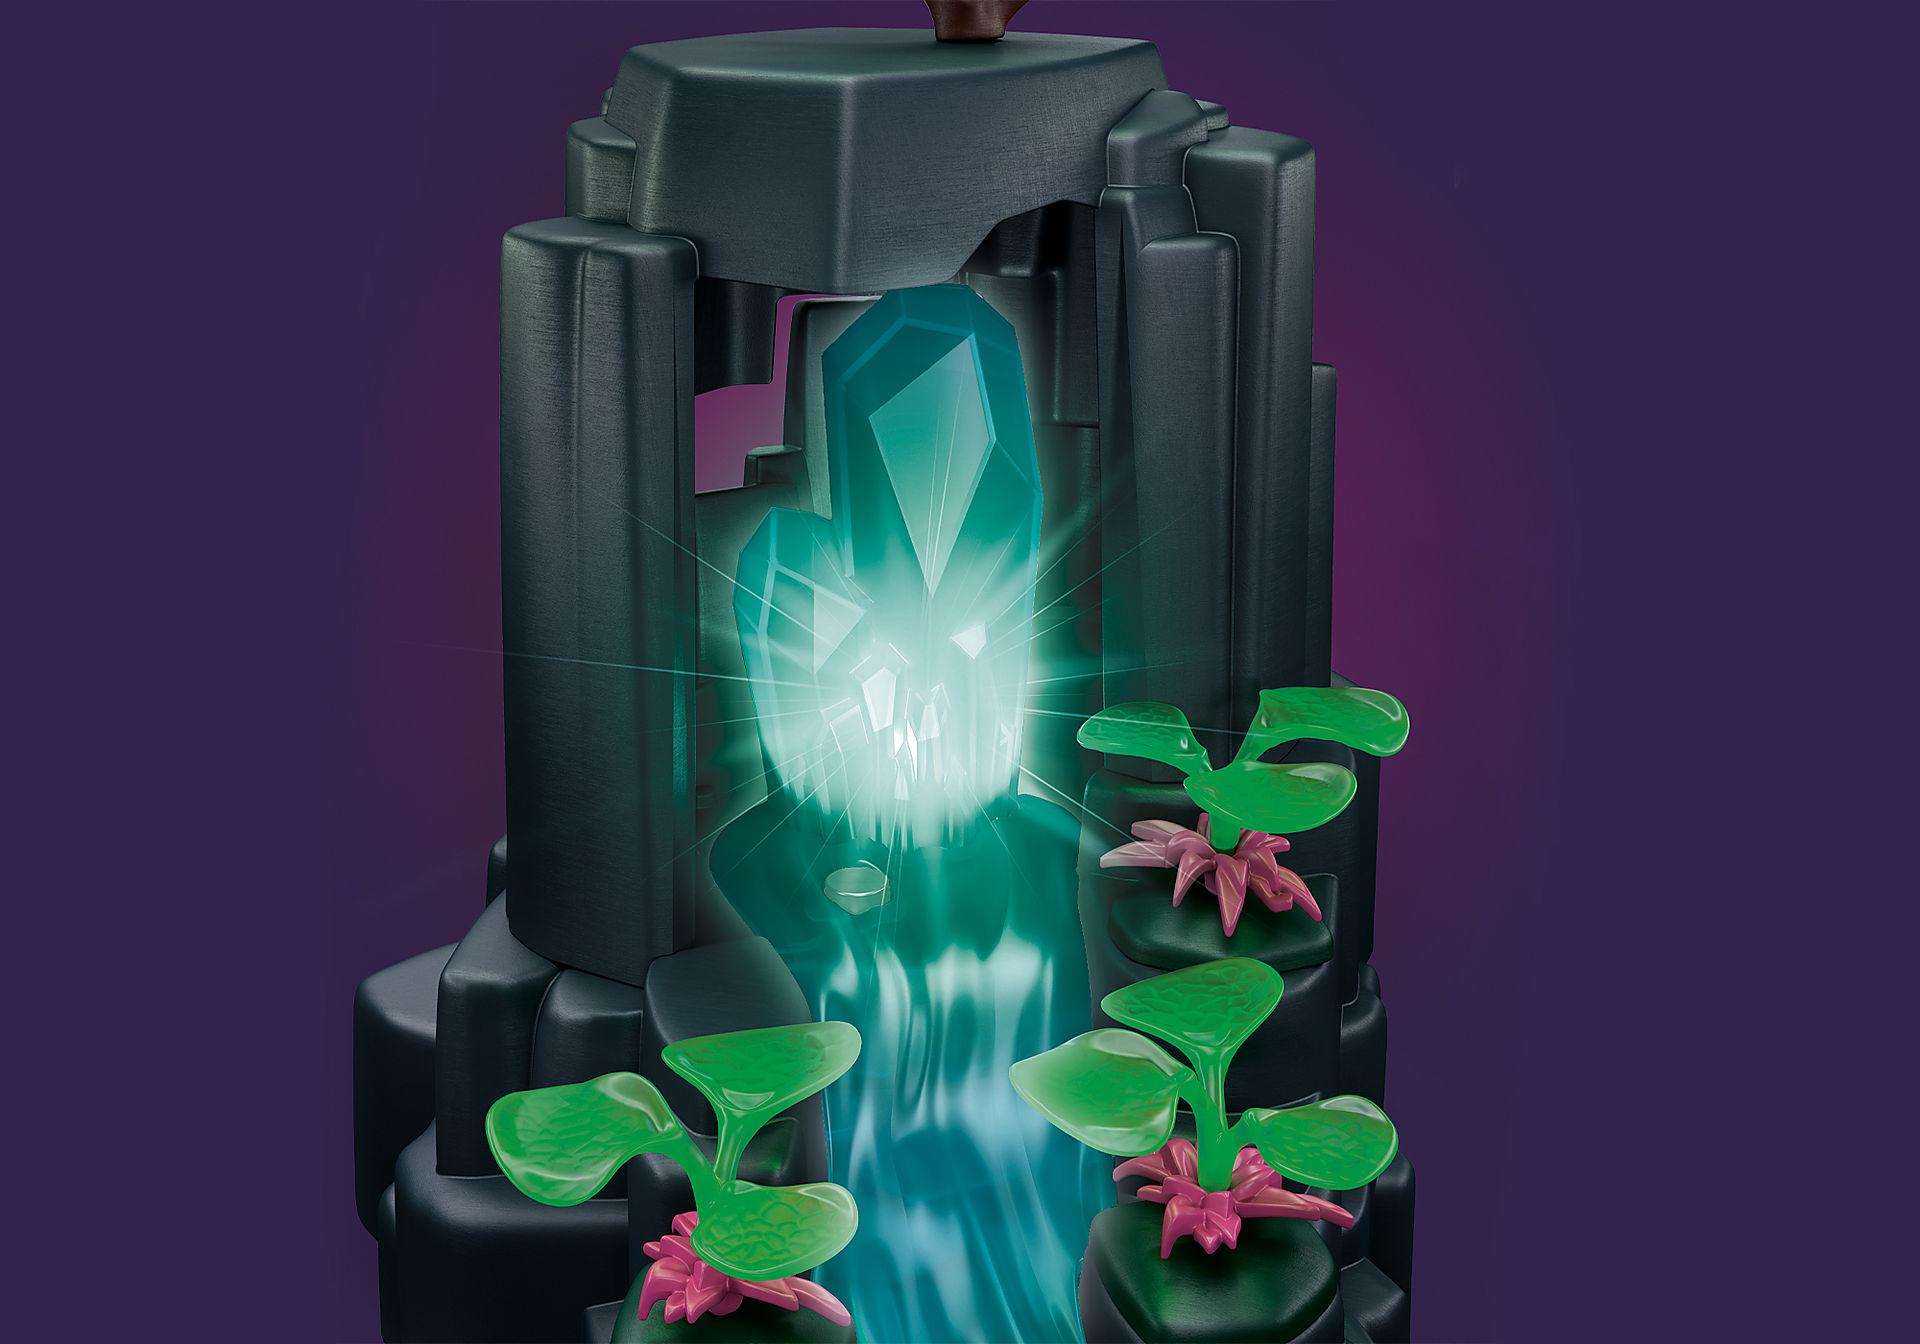 70800 Magical Energy Source zoom image9